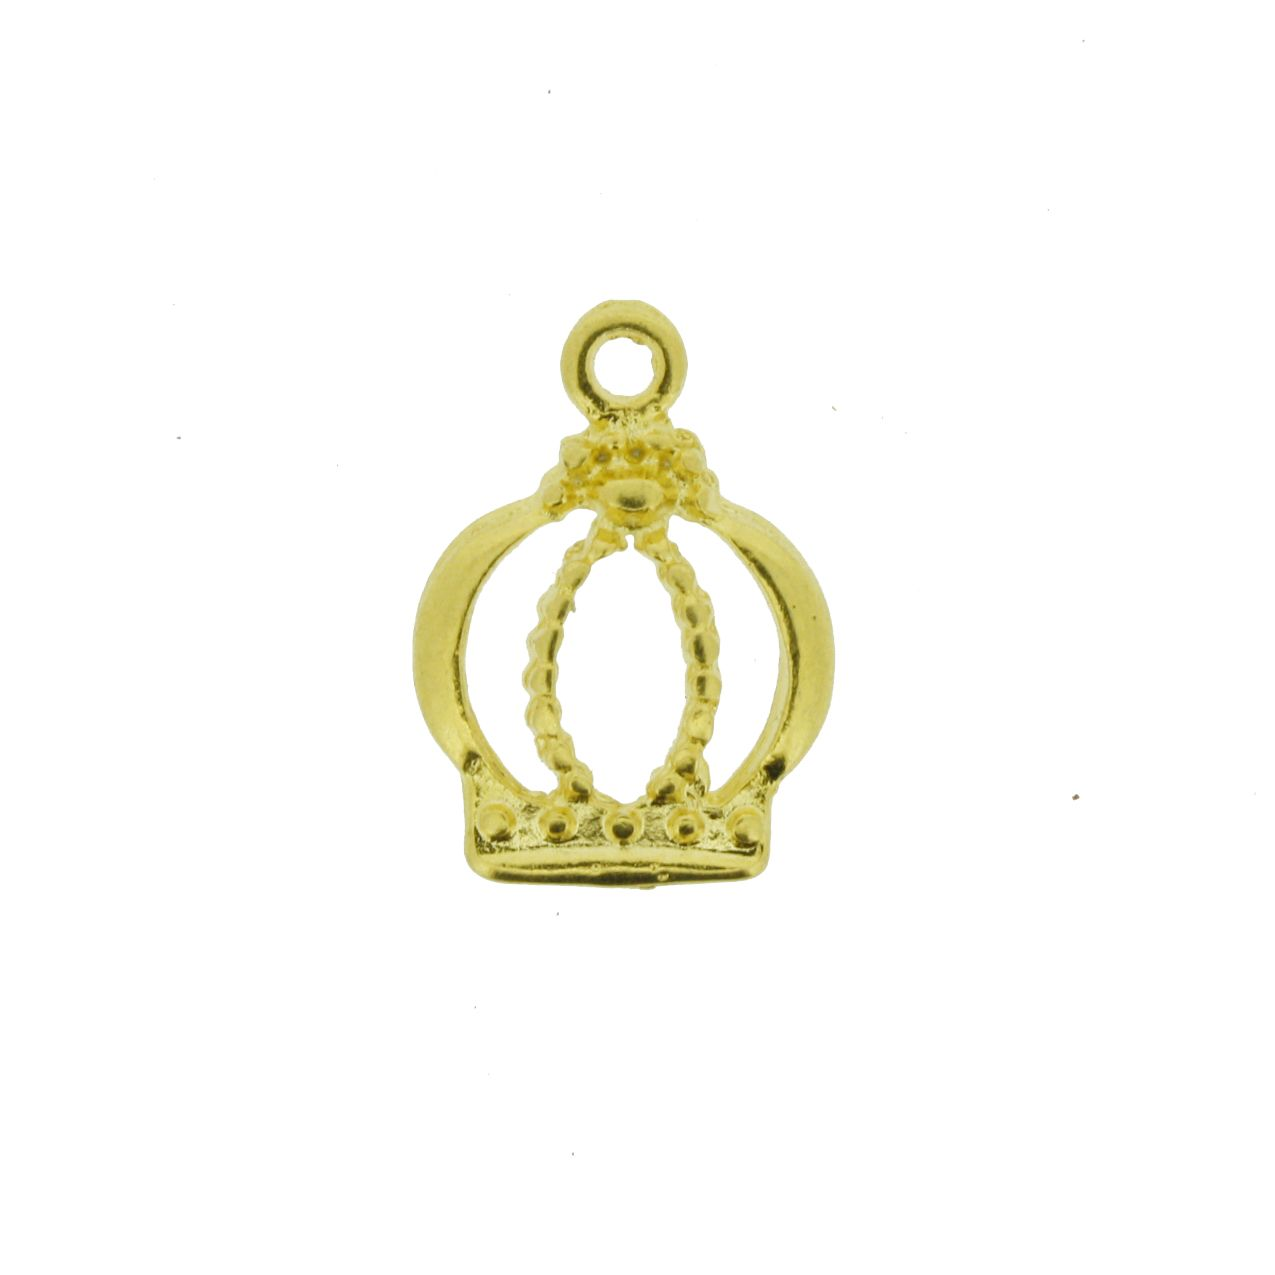 Coroa - Dourada - 17mm   - Universo Religioso® - Artigos de Umbanda e Candomblé